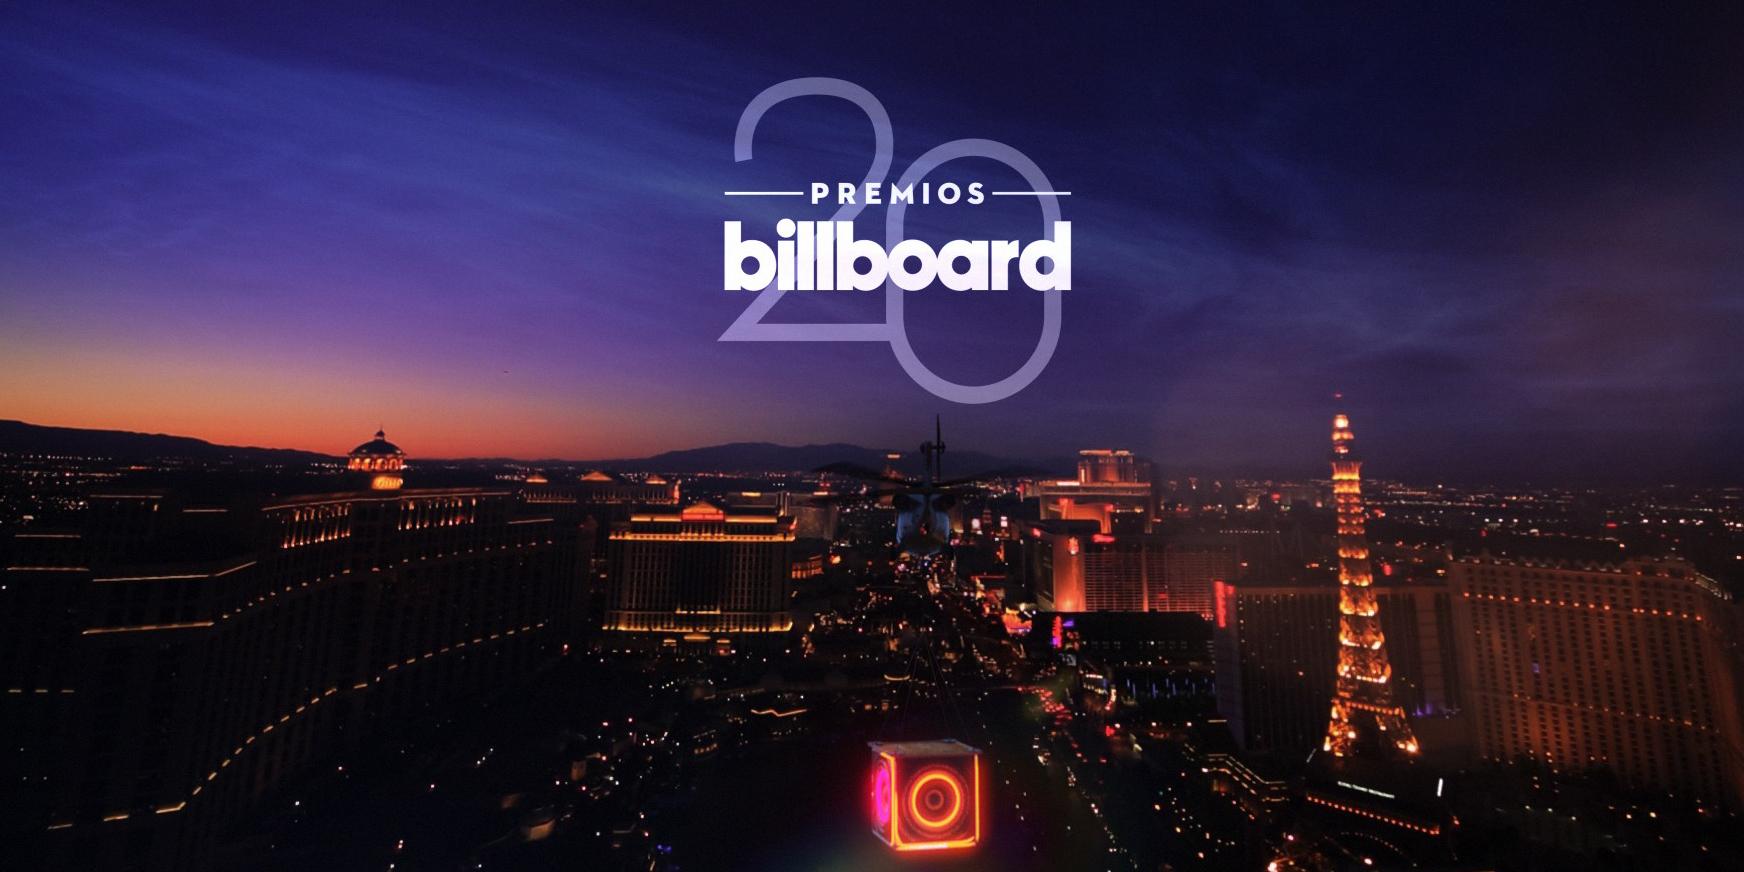 Telemundo | Premios Billboard Teaser